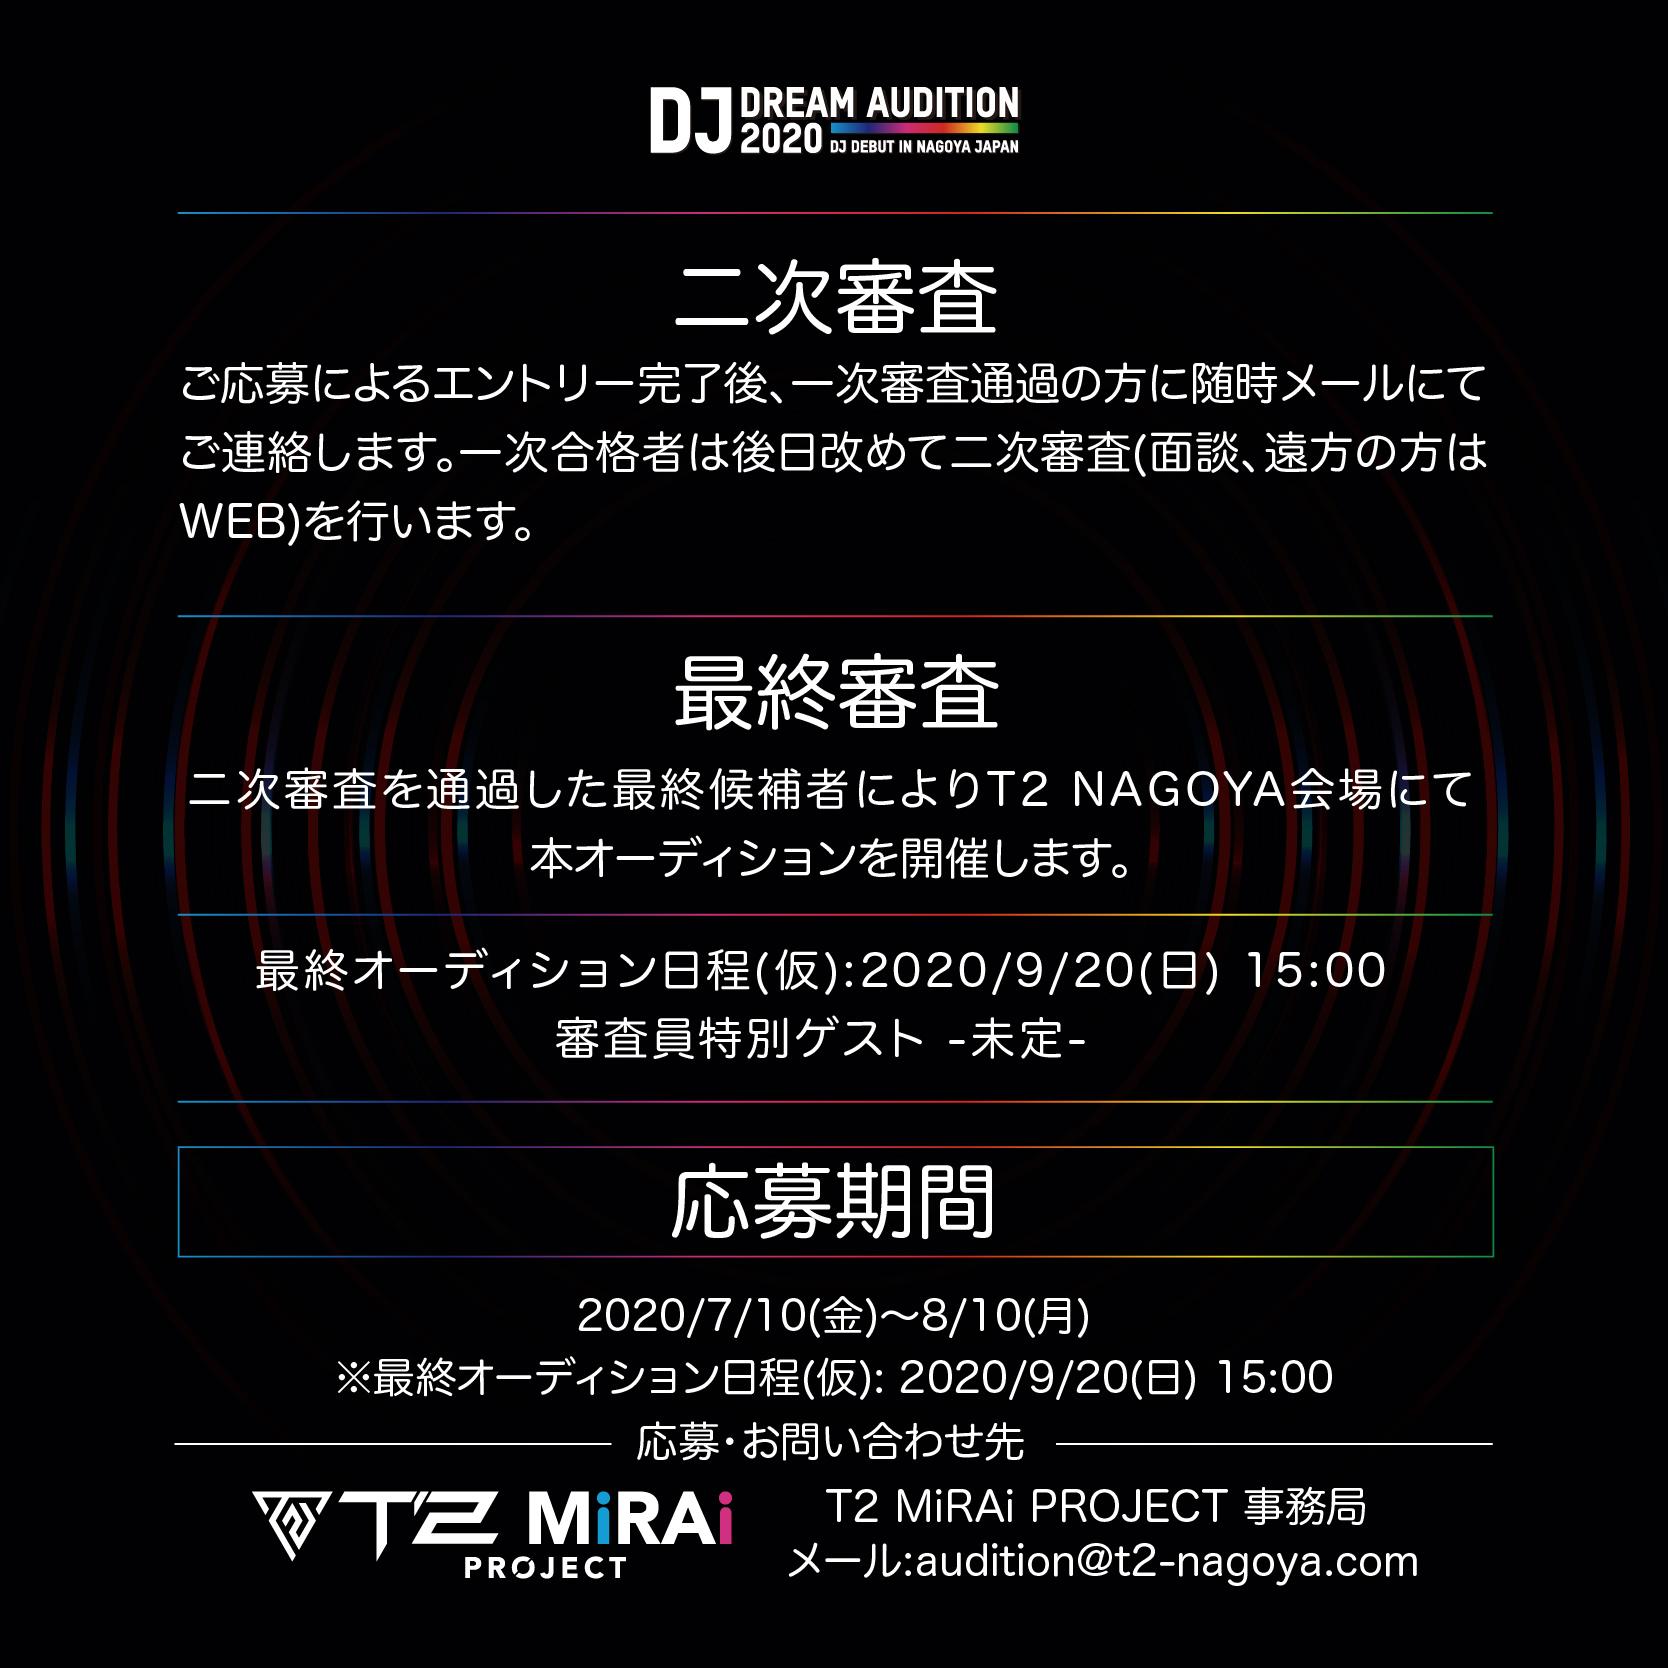 DJ DREAM AUDITION 2020